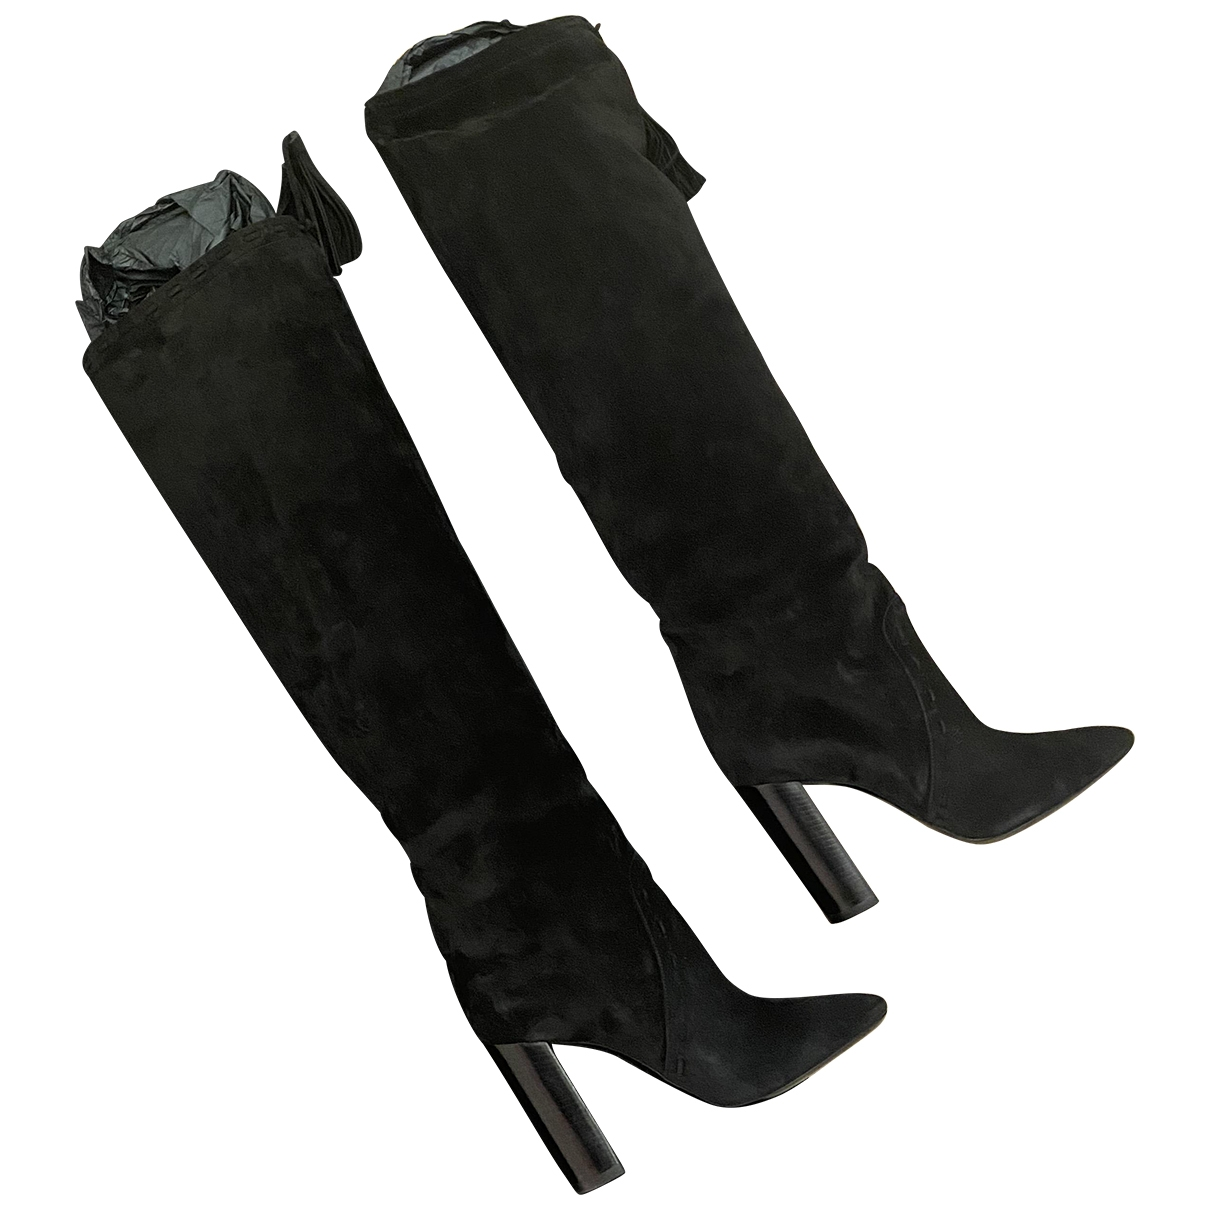 Saint Laurent Meurice Black Suede Boots for Women 39.5 EU